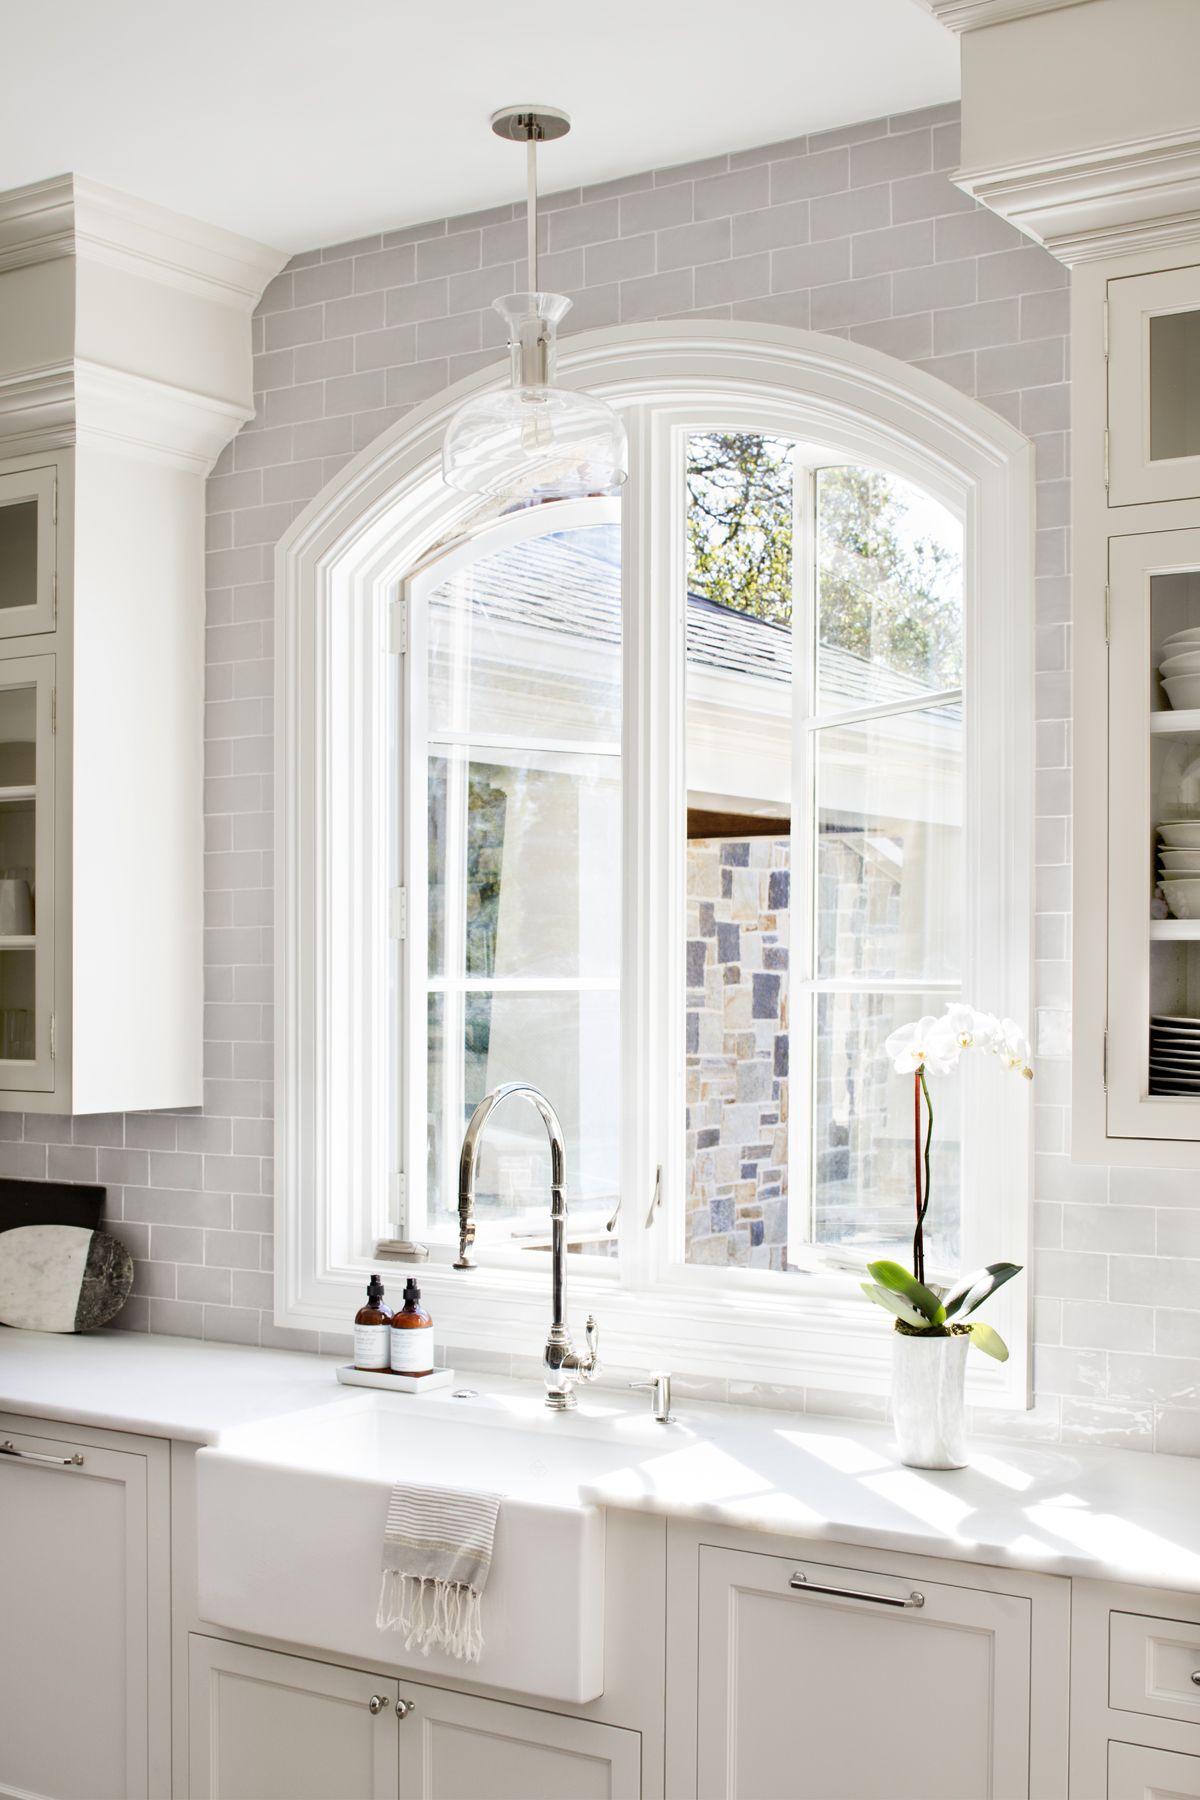 Stephanie Interiors Custom Kitchen White Cabinets Polished Nickel Hardware